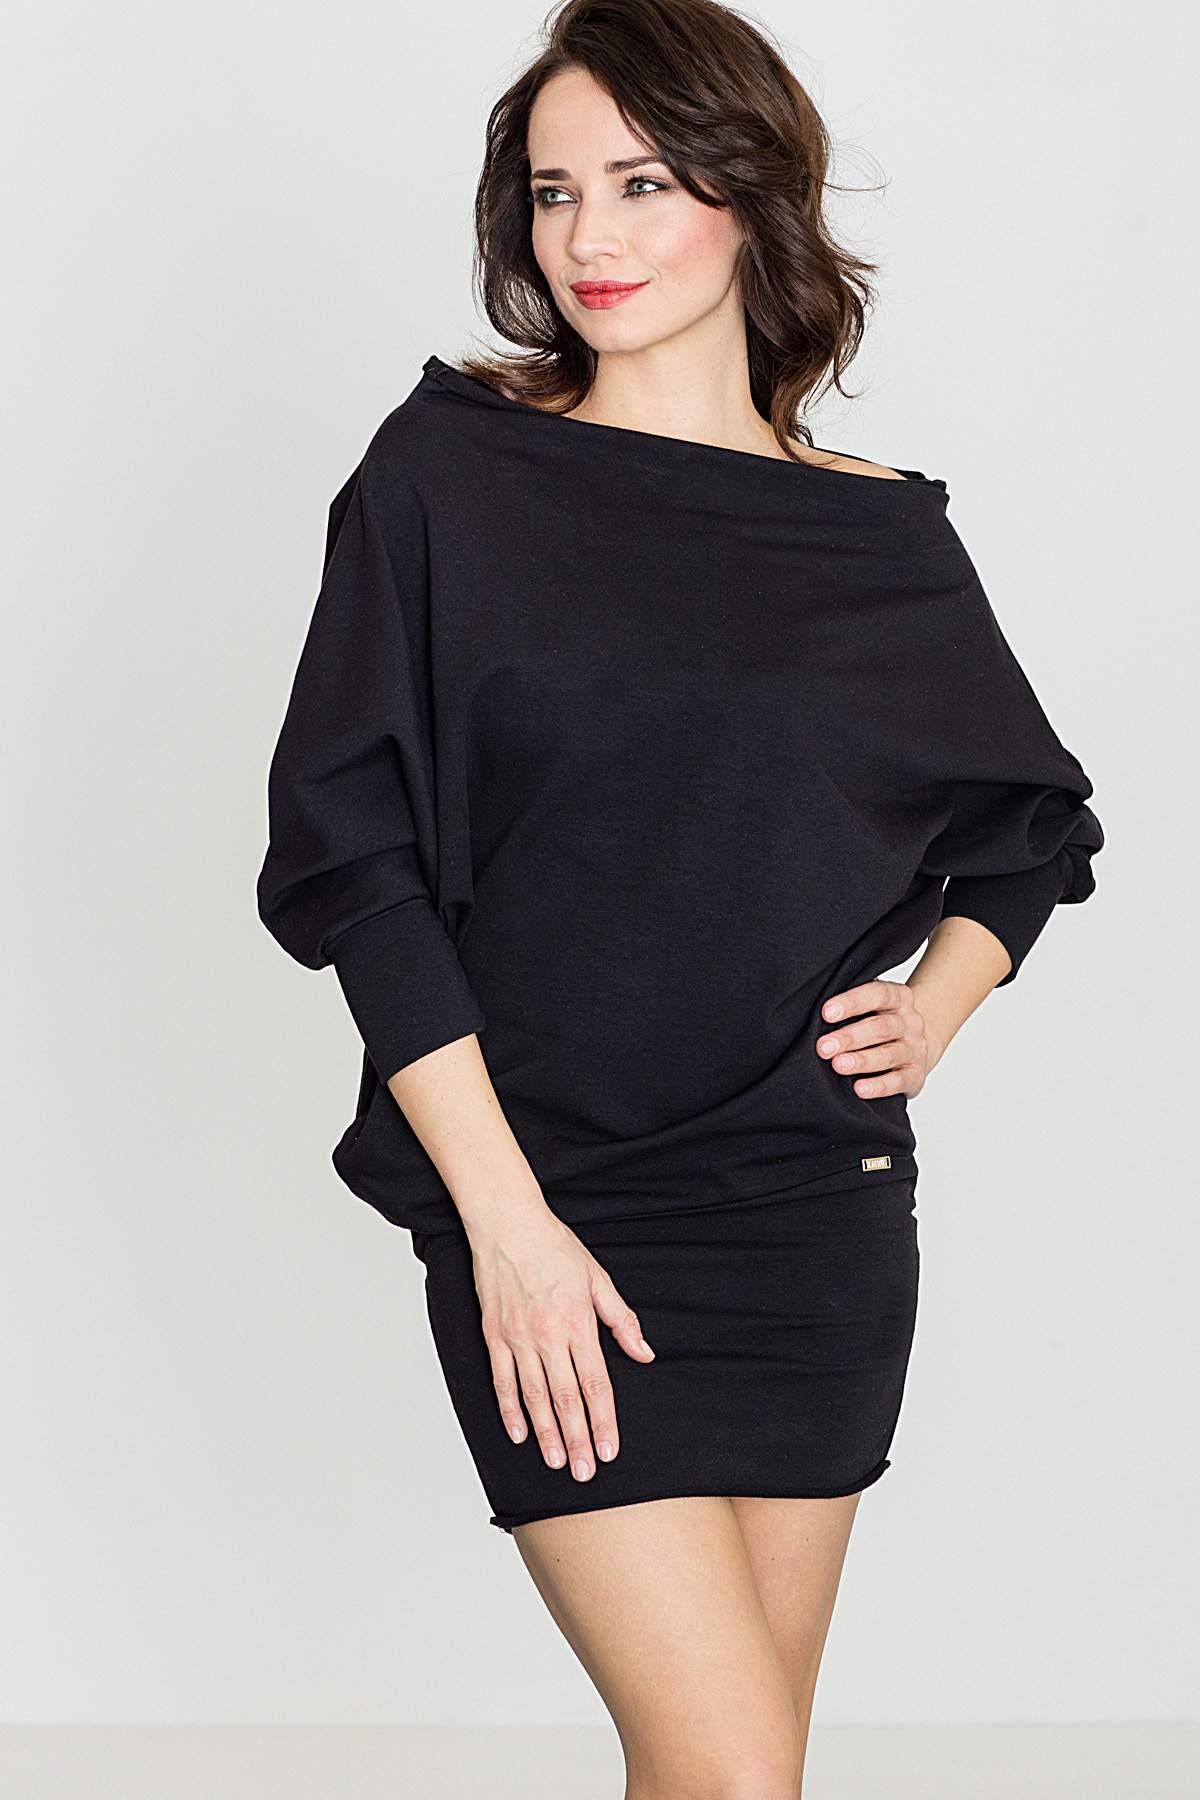 097fca2886d Γυναικεία Ρούχα, Γυναικεία Φορέματα, Βραδινά Φορέματα